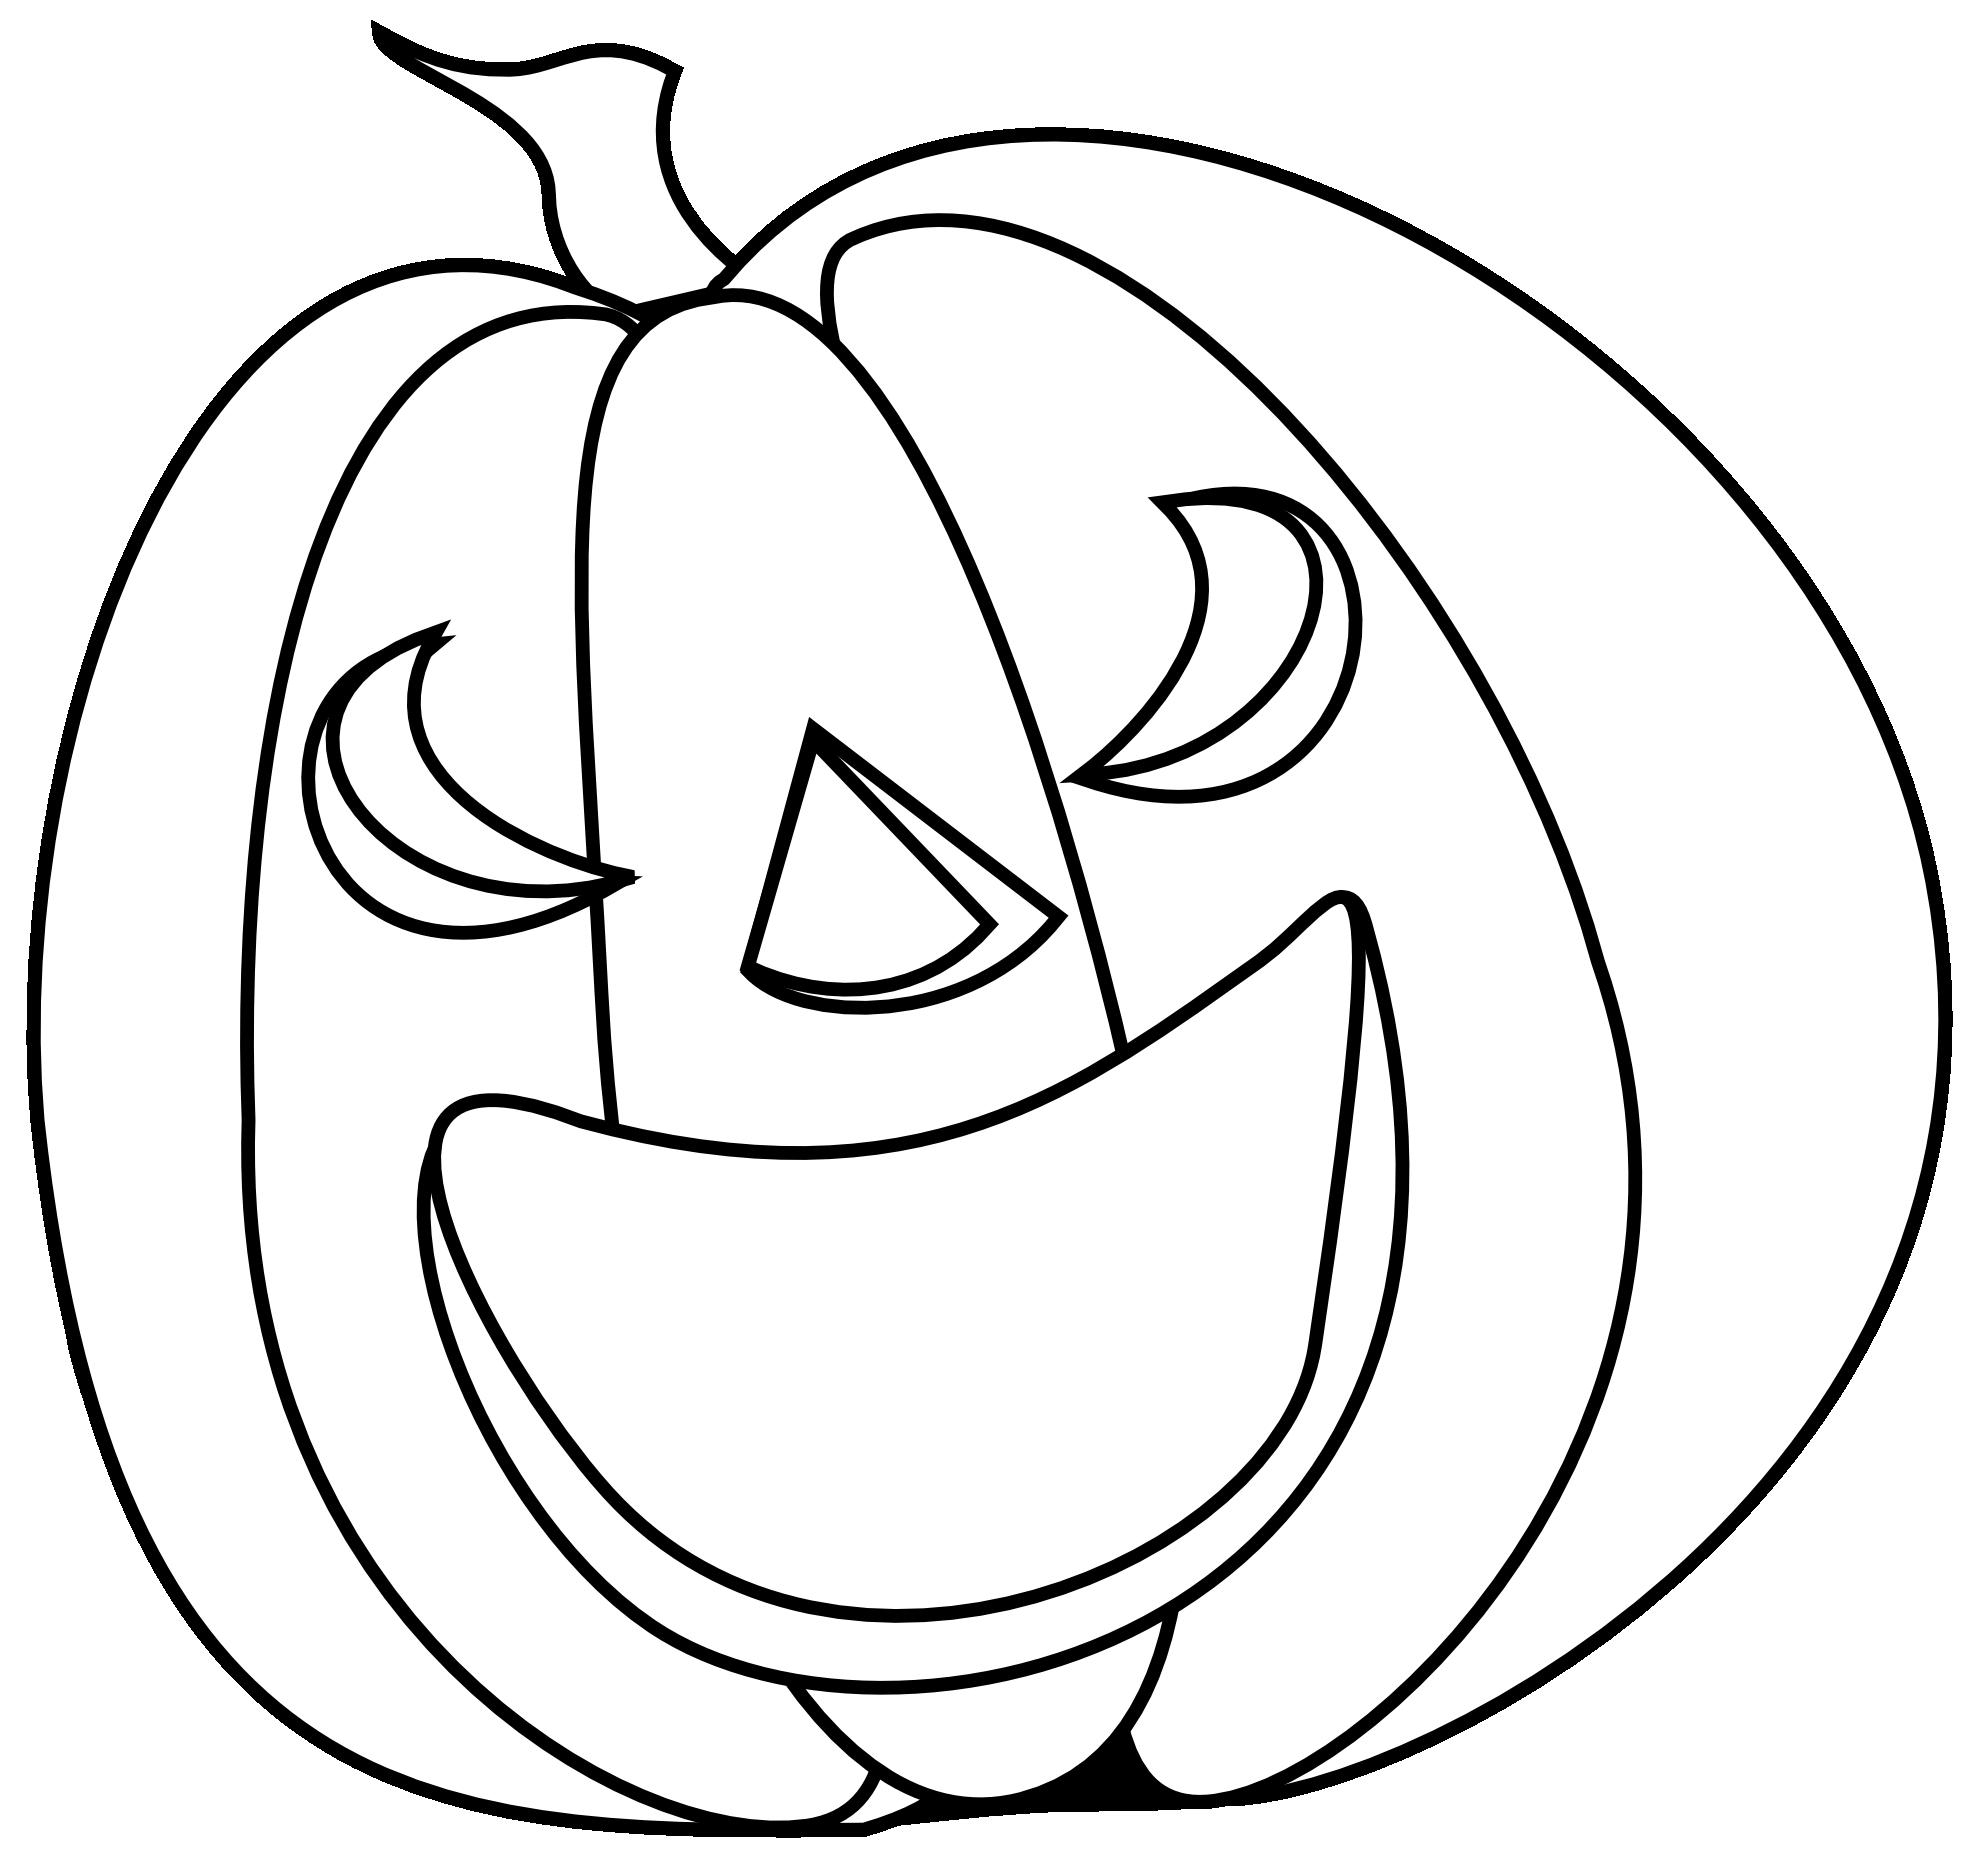 Pumpkin clipart black and white vines image transparent Black And White Halloween Pumpkin Clipart - Clip Art Library image transparent